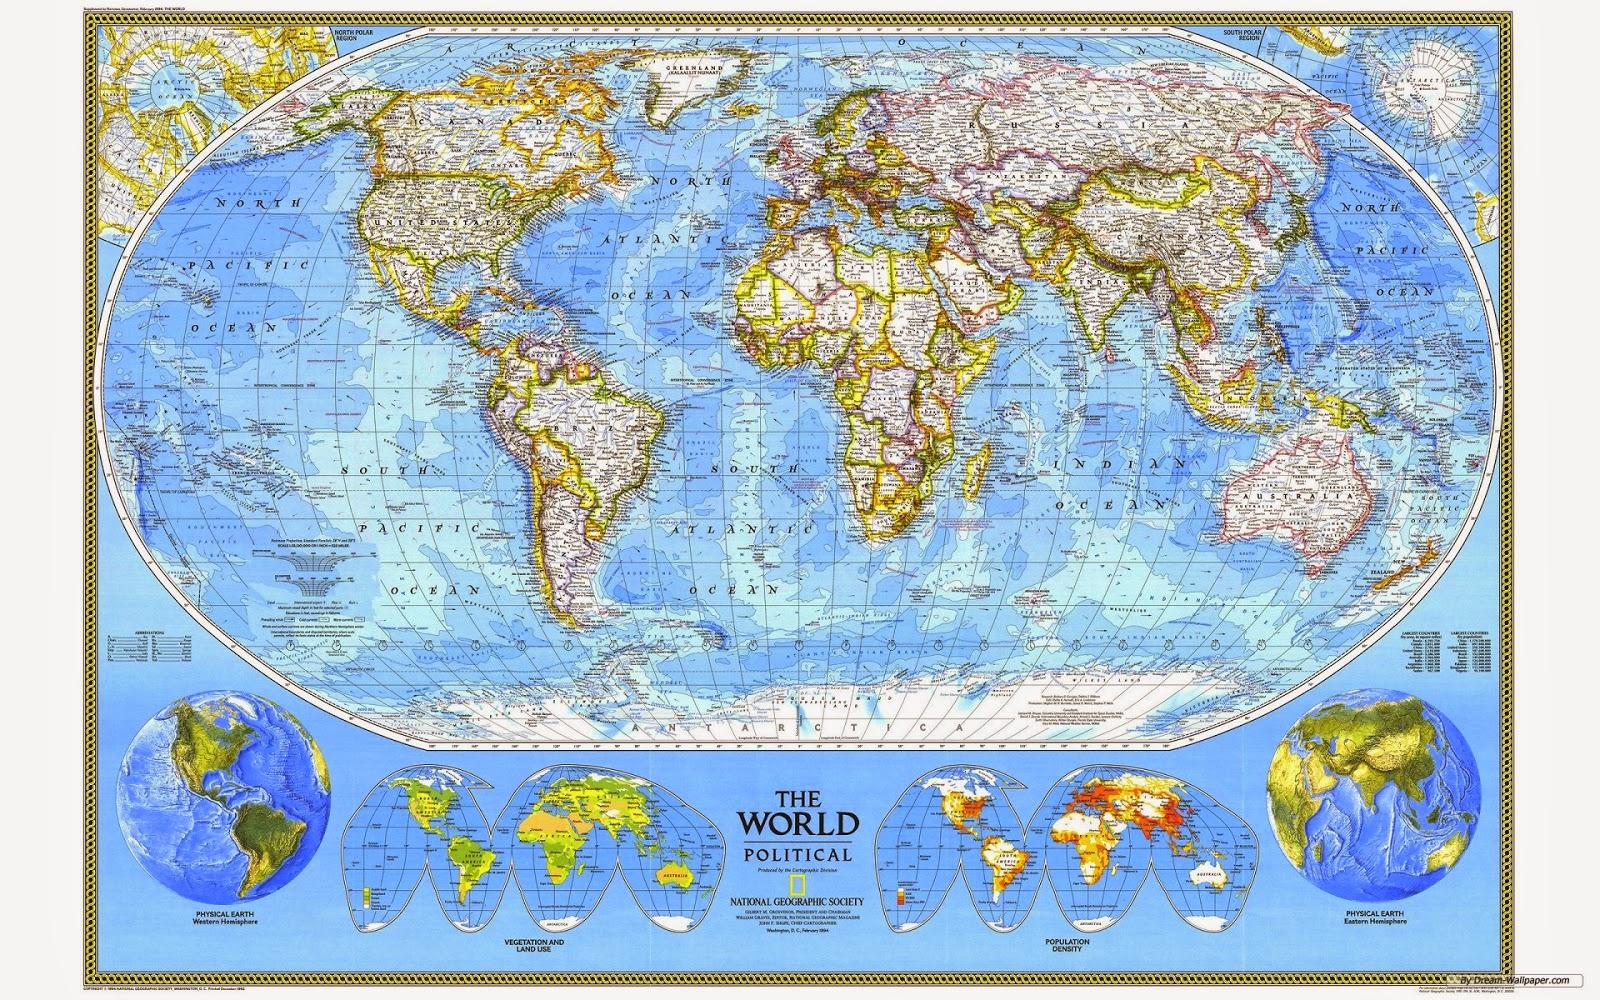 World map desktop wallpaper hd wallpapersafari world map wallpaper for walls world map desktop wallpaper world map 1600x1000 freerunsca Image collections